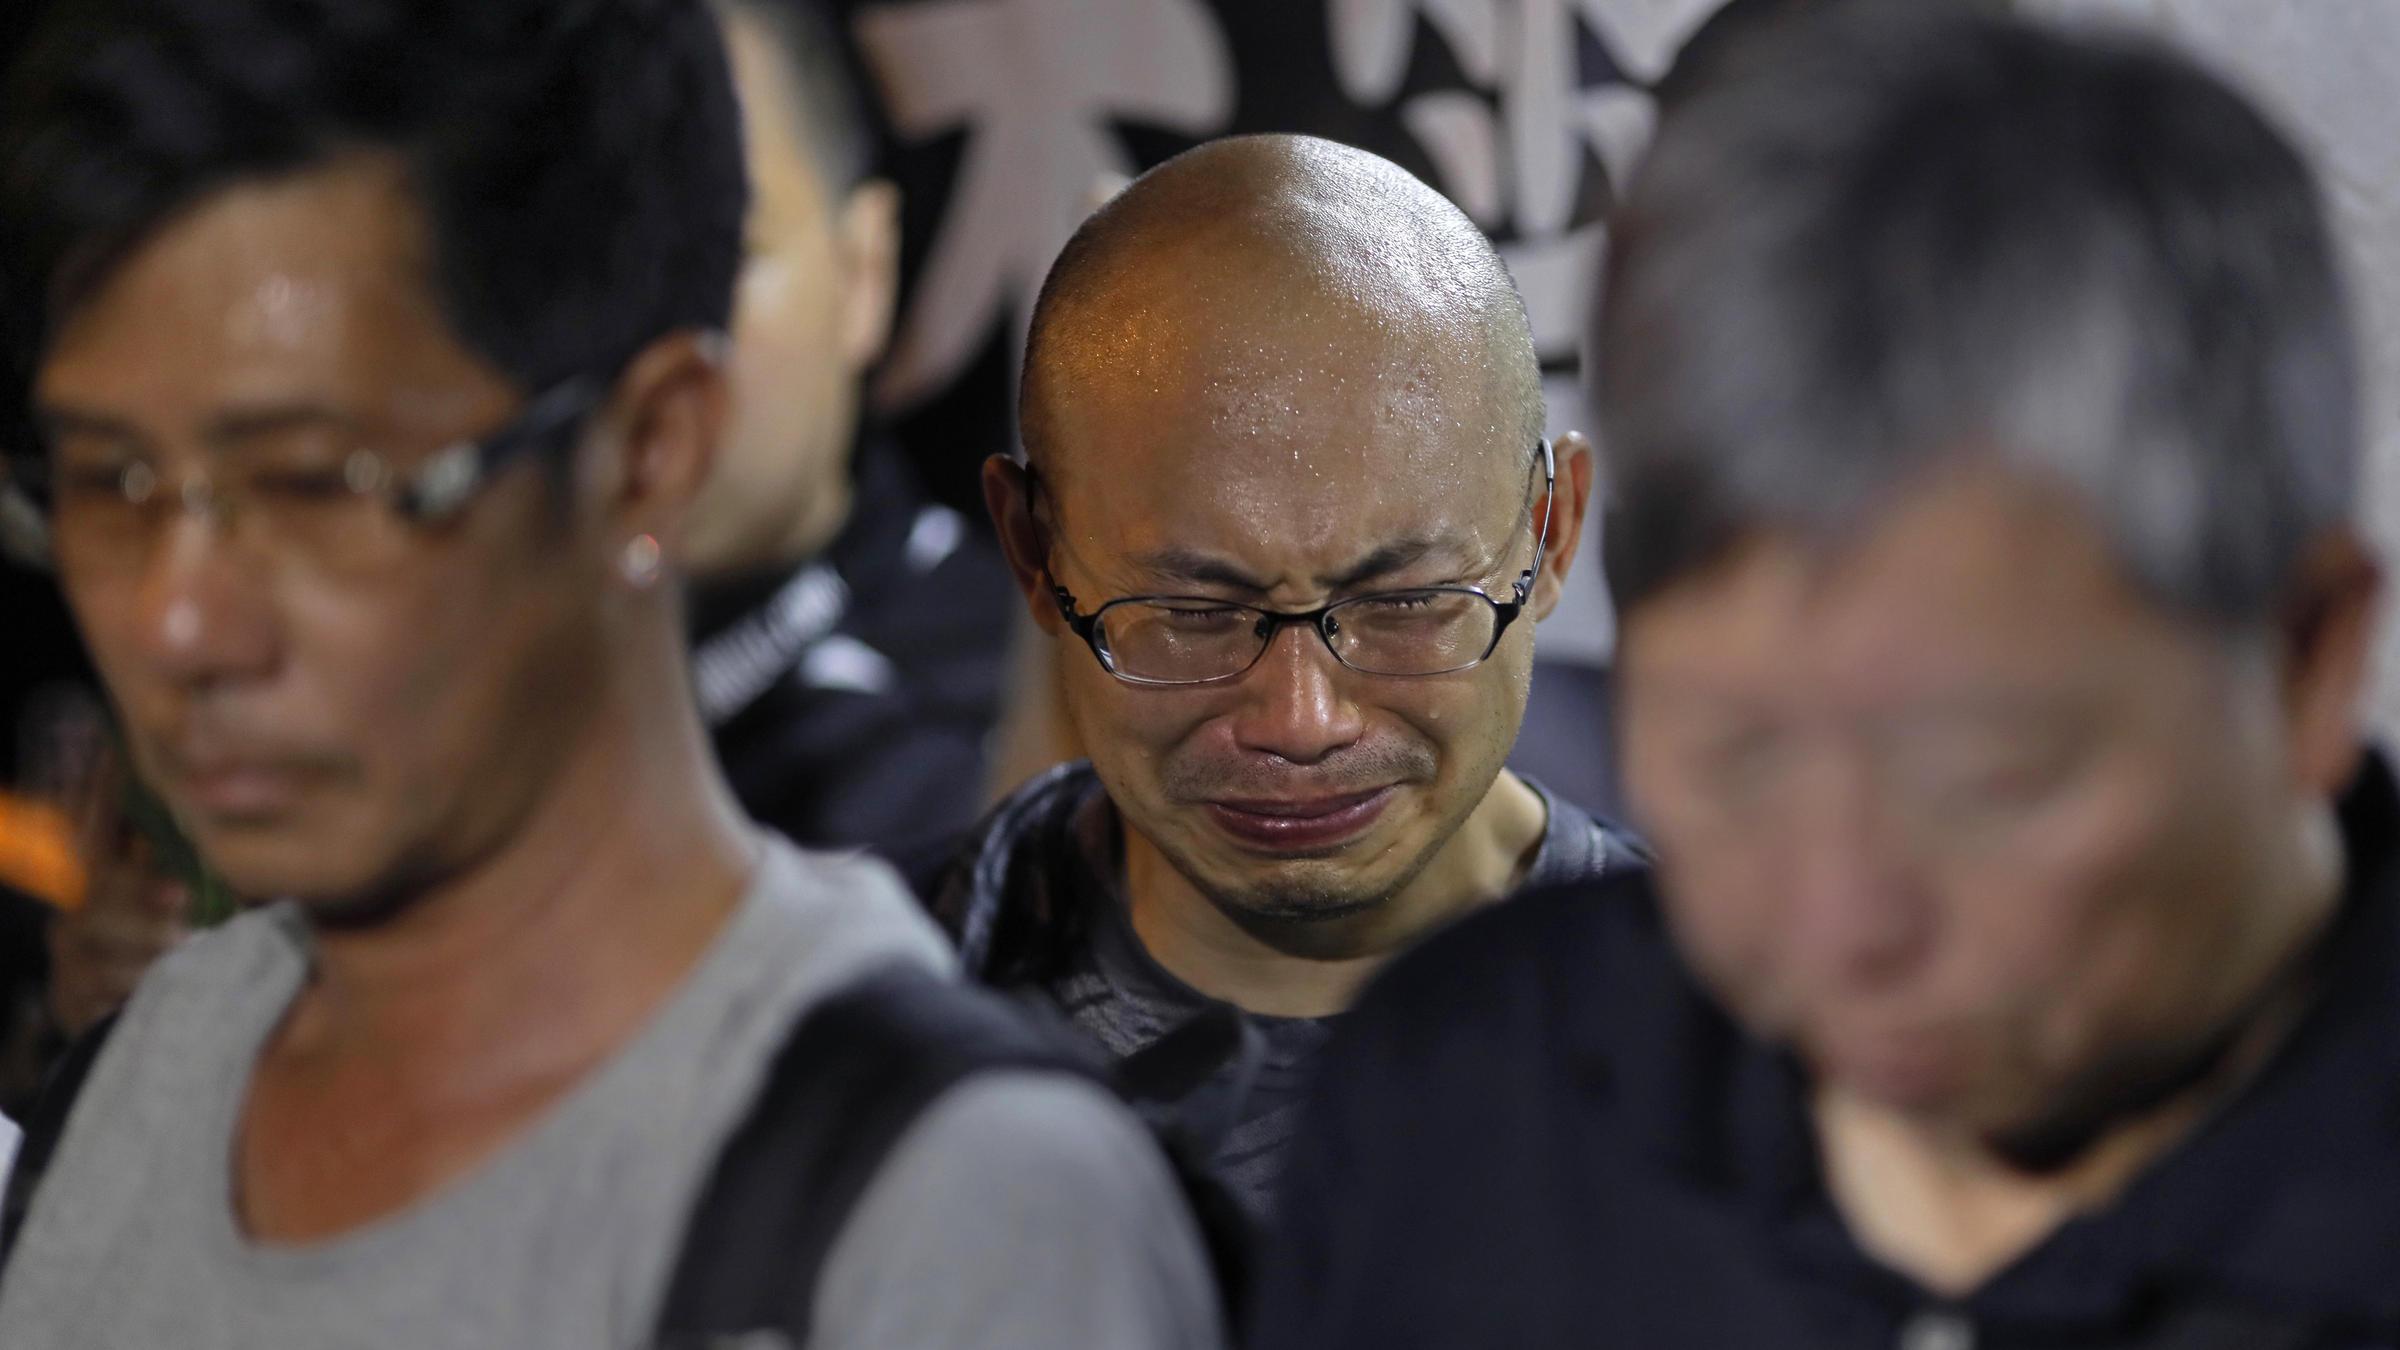 Chinese Nobel laureate Liu Xiaobo's health worsening, hospital says